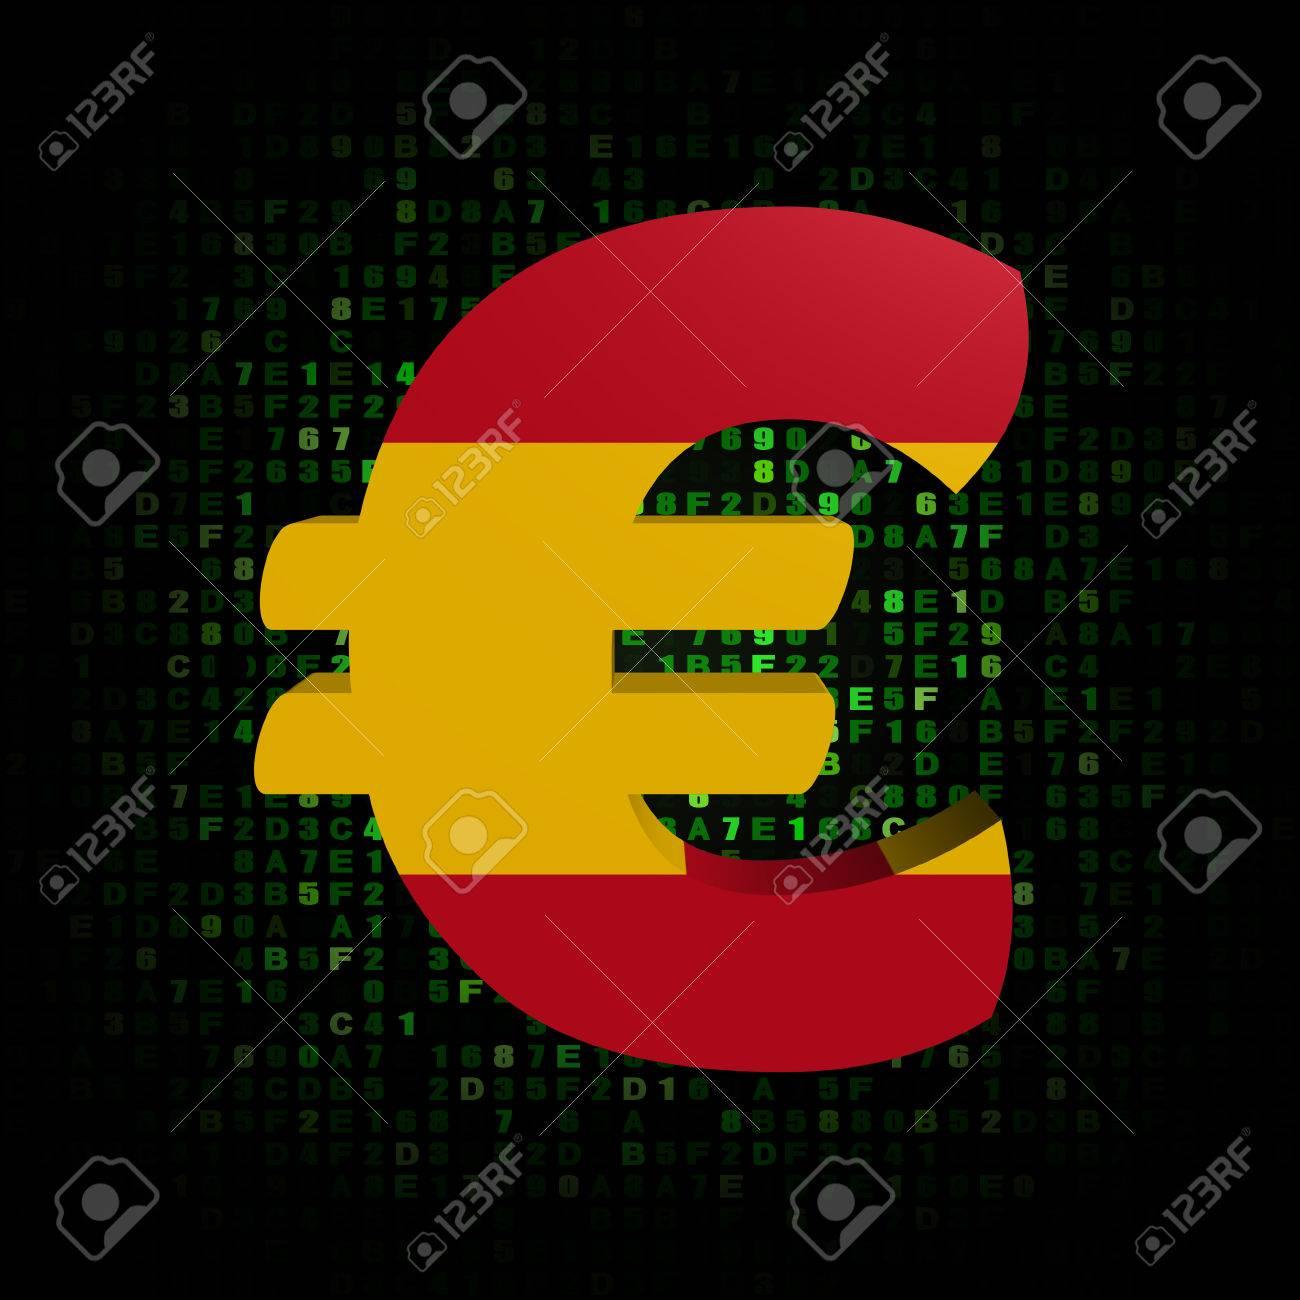 Euro Symbol With Spanish Flag On Hex Code Illustration Stock Photo